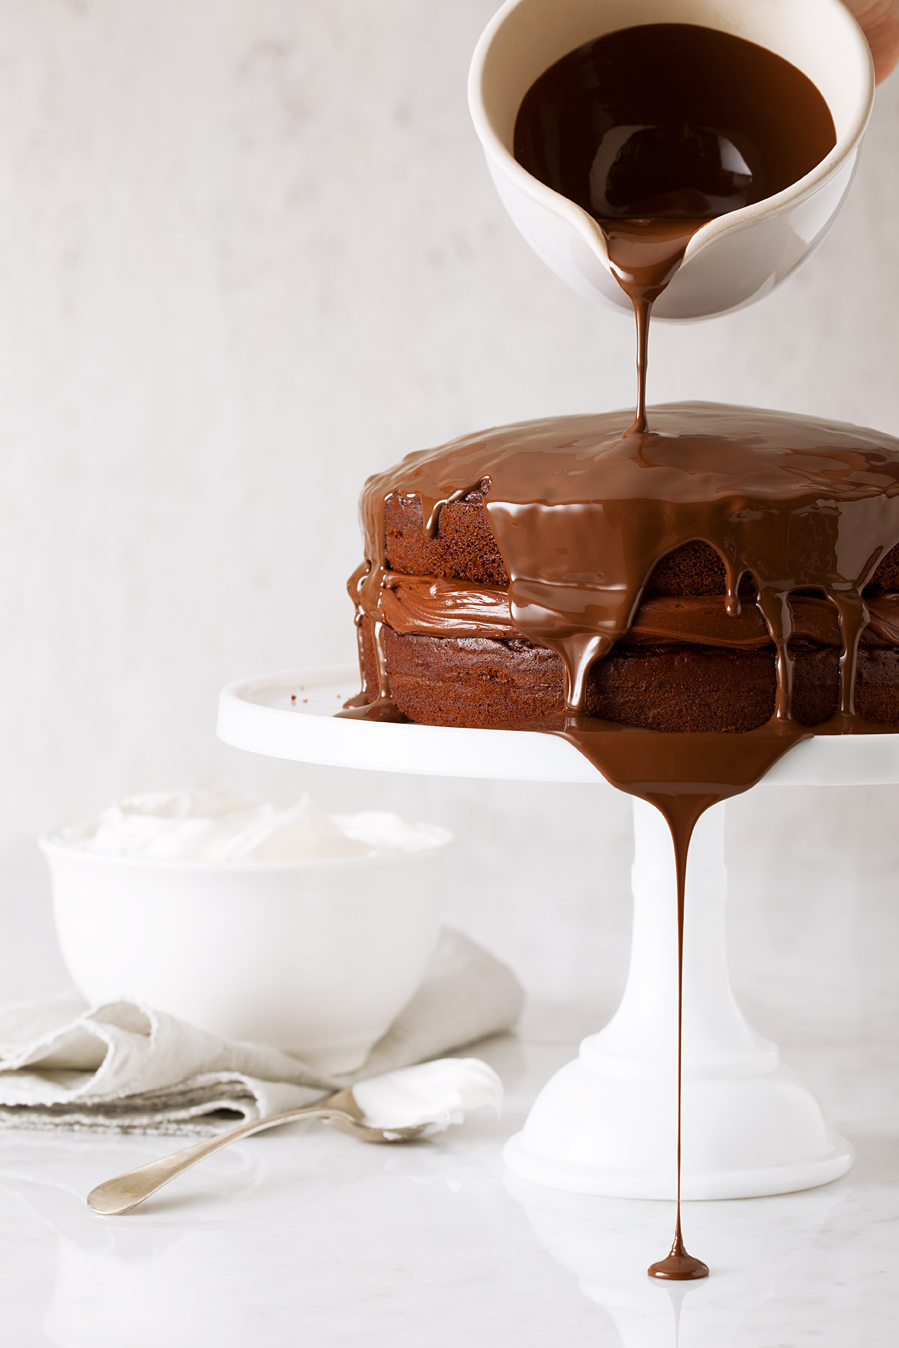 Choc-Cake-Pour-185-2.jpg